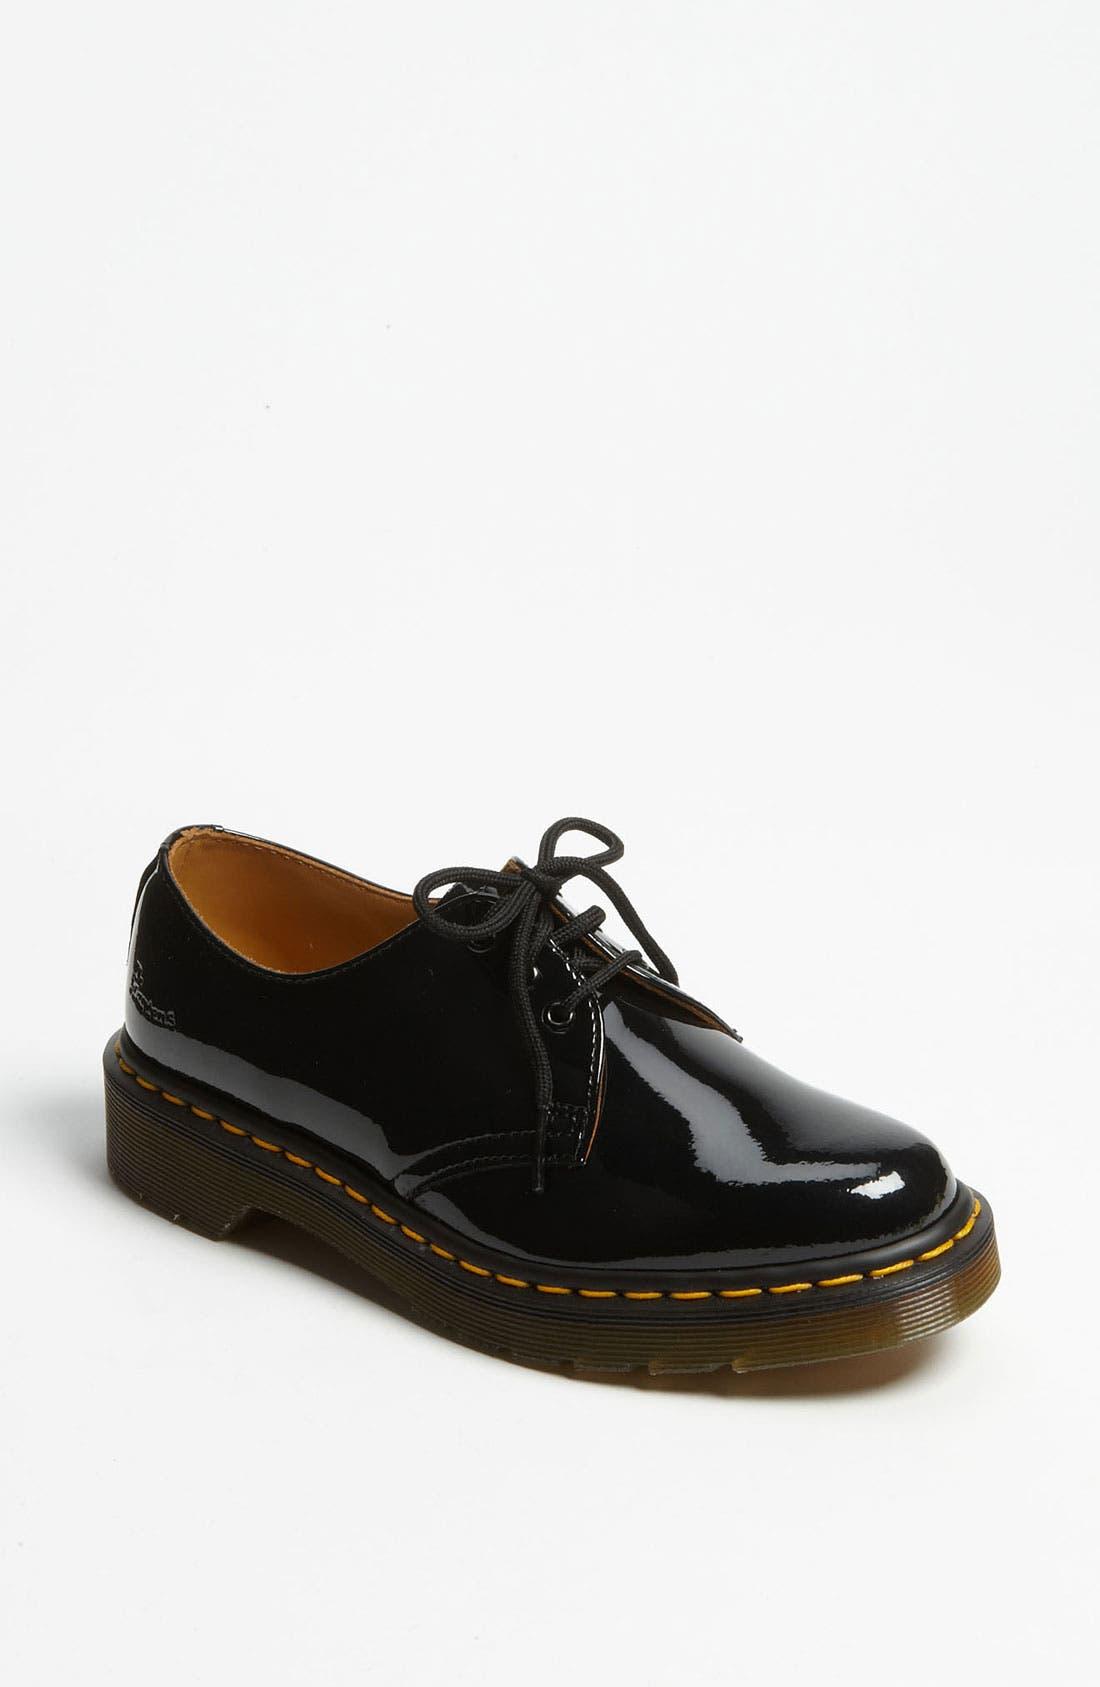 3-Eye Oxford,                         Main,                         color, Black Patent